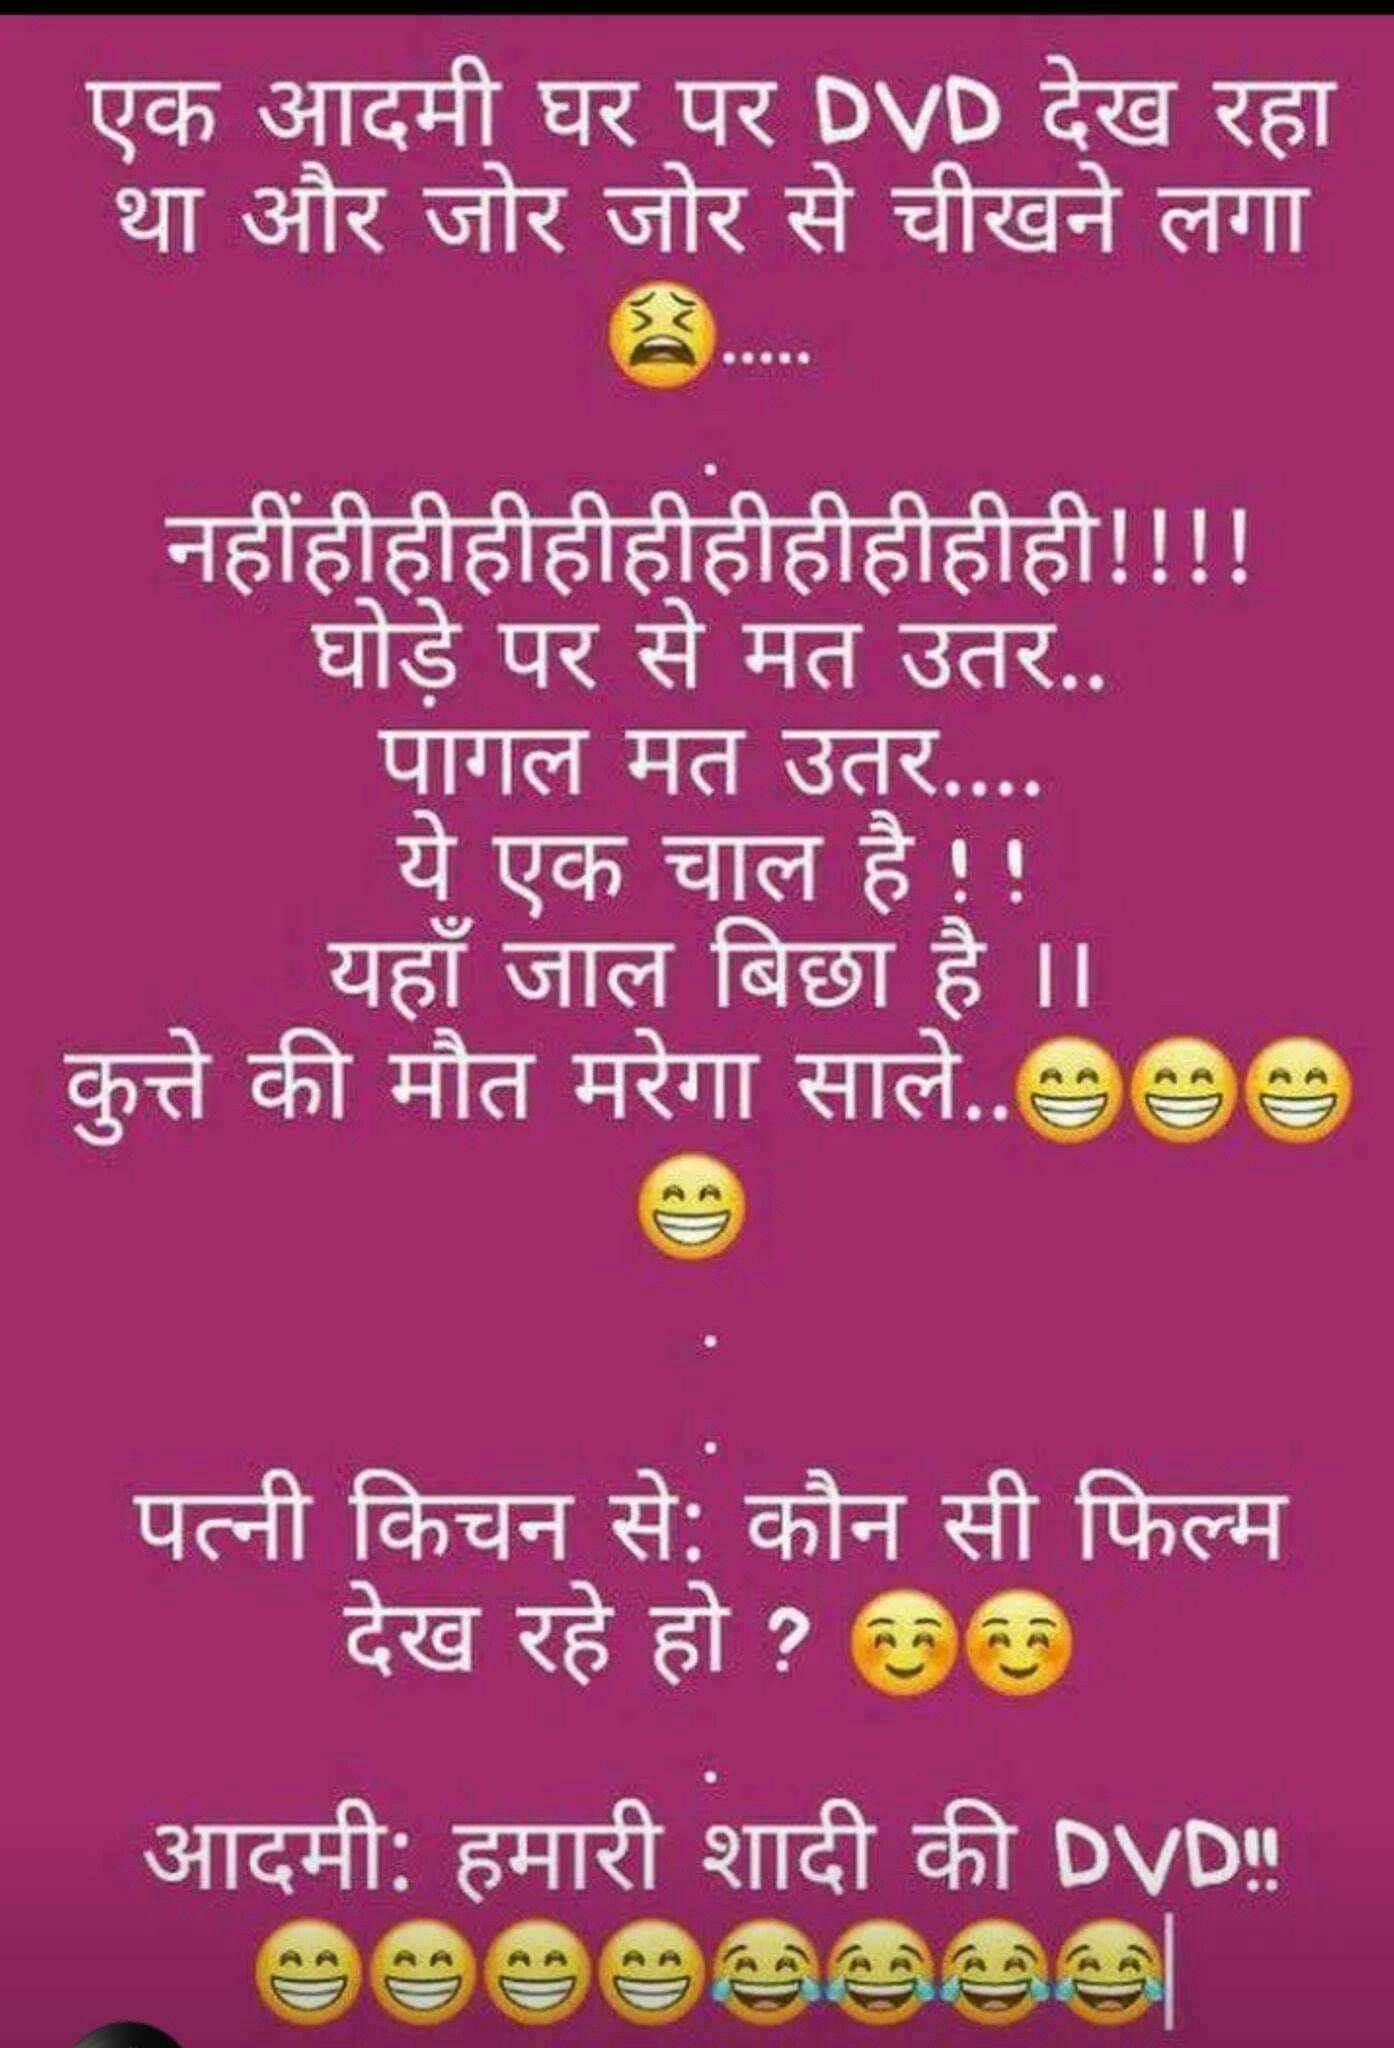 Pin By Beautiful Life Skl On Jokes Some Funny Jokes Fun Quotes Funny Romantic Jokes